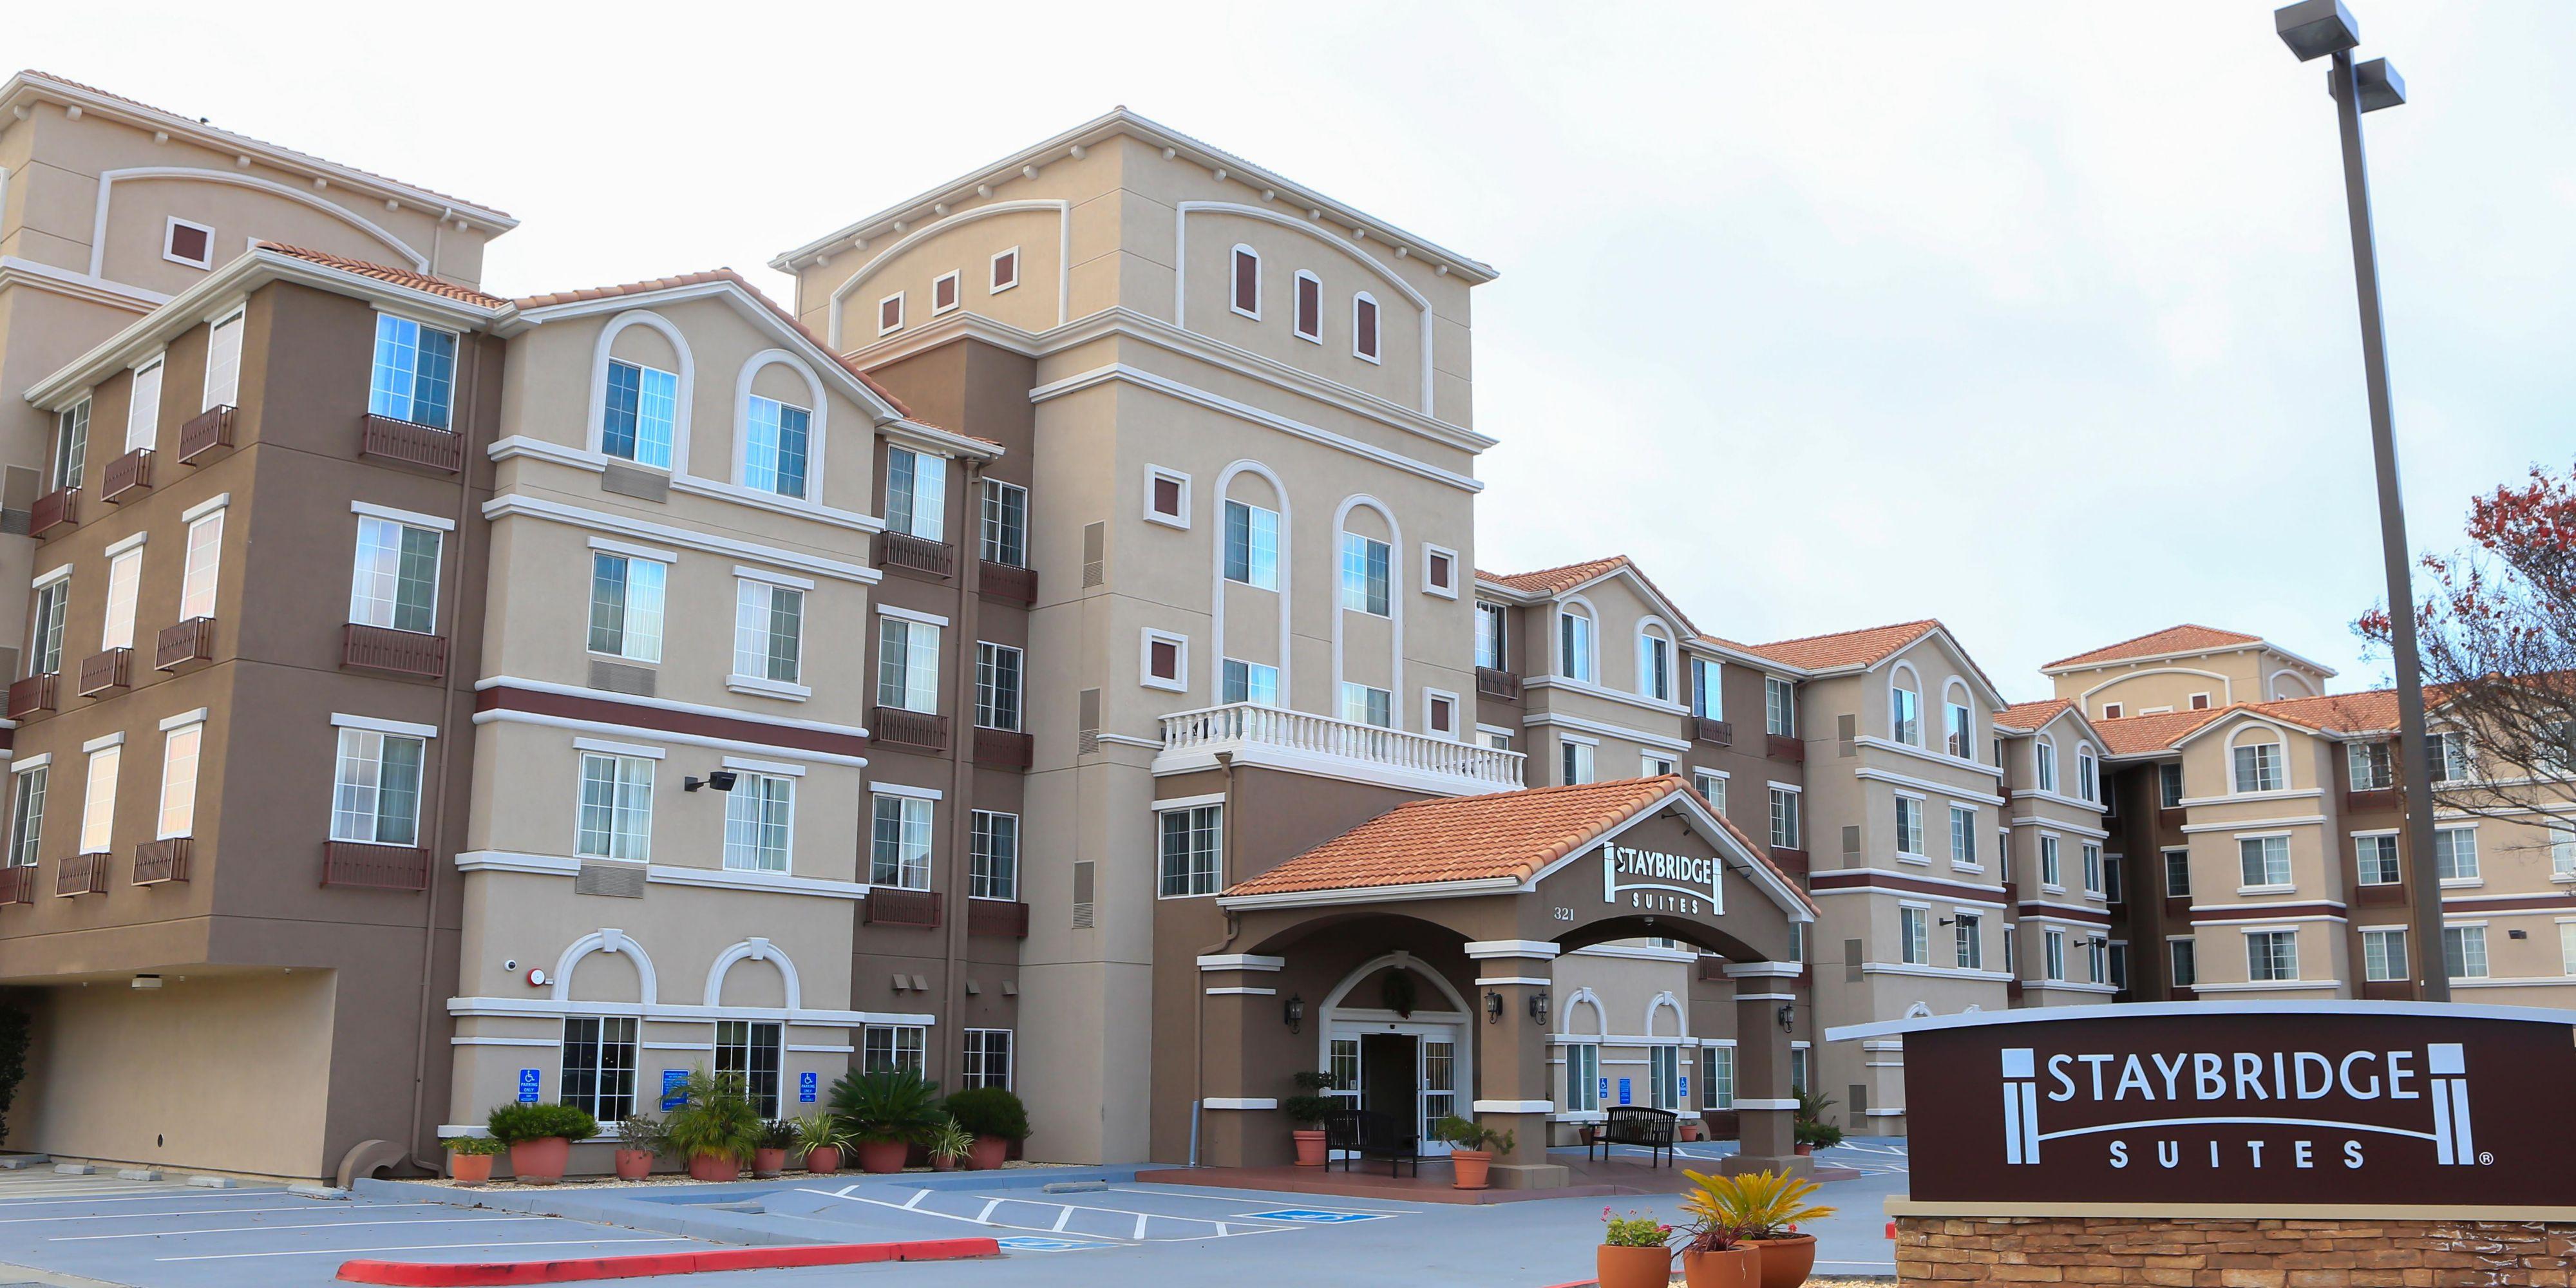 Staybridge Suites Silicon Valley-Milpitas image 0